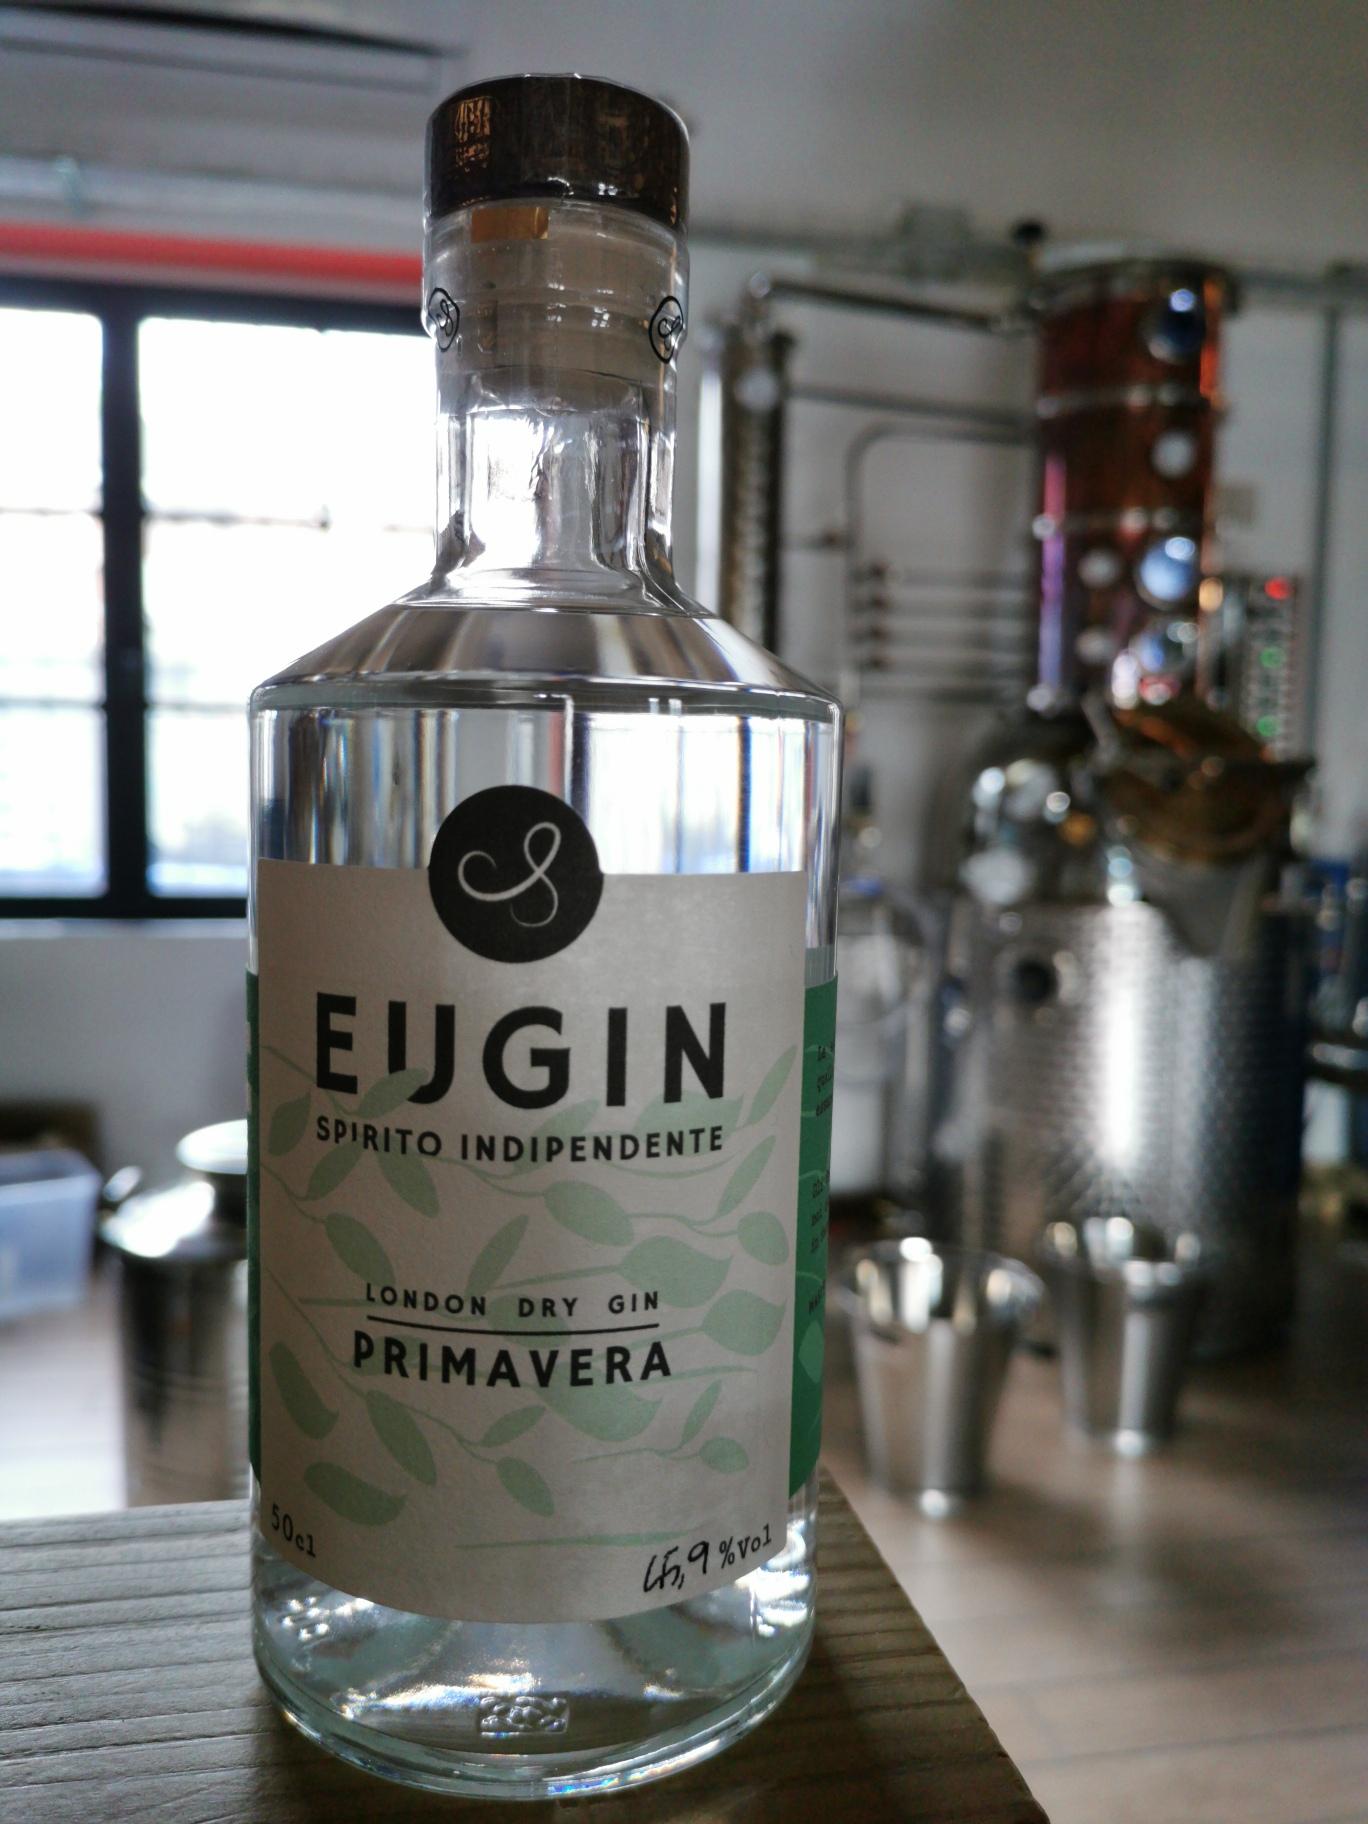 Eugin Distilleria